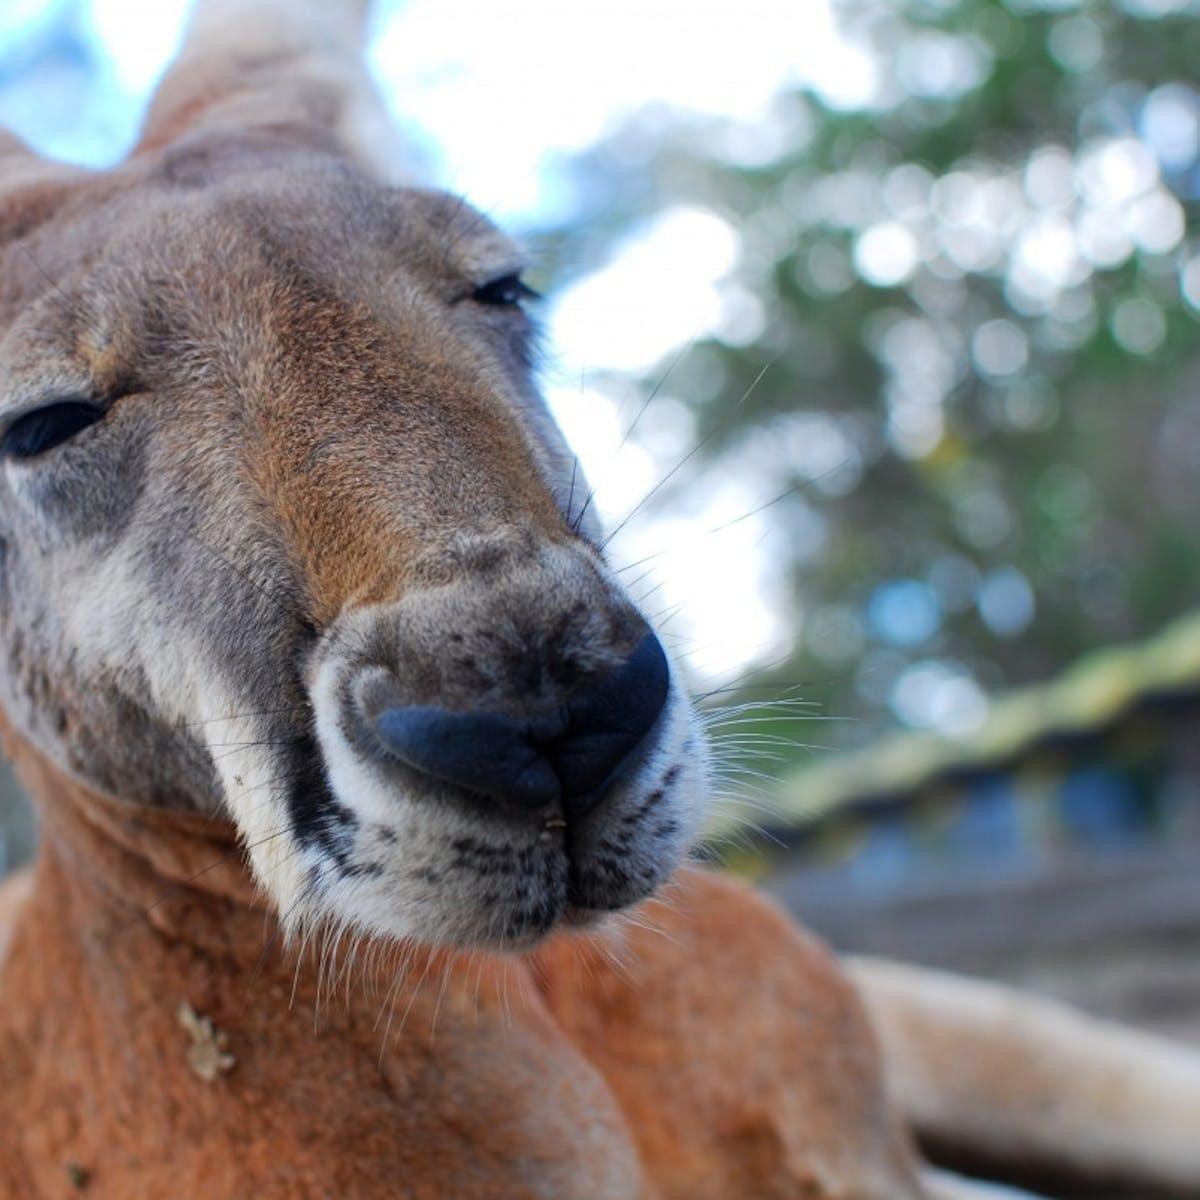 Wild Australian Grass Got Kangaroos So High They Couldn't Walk Straight